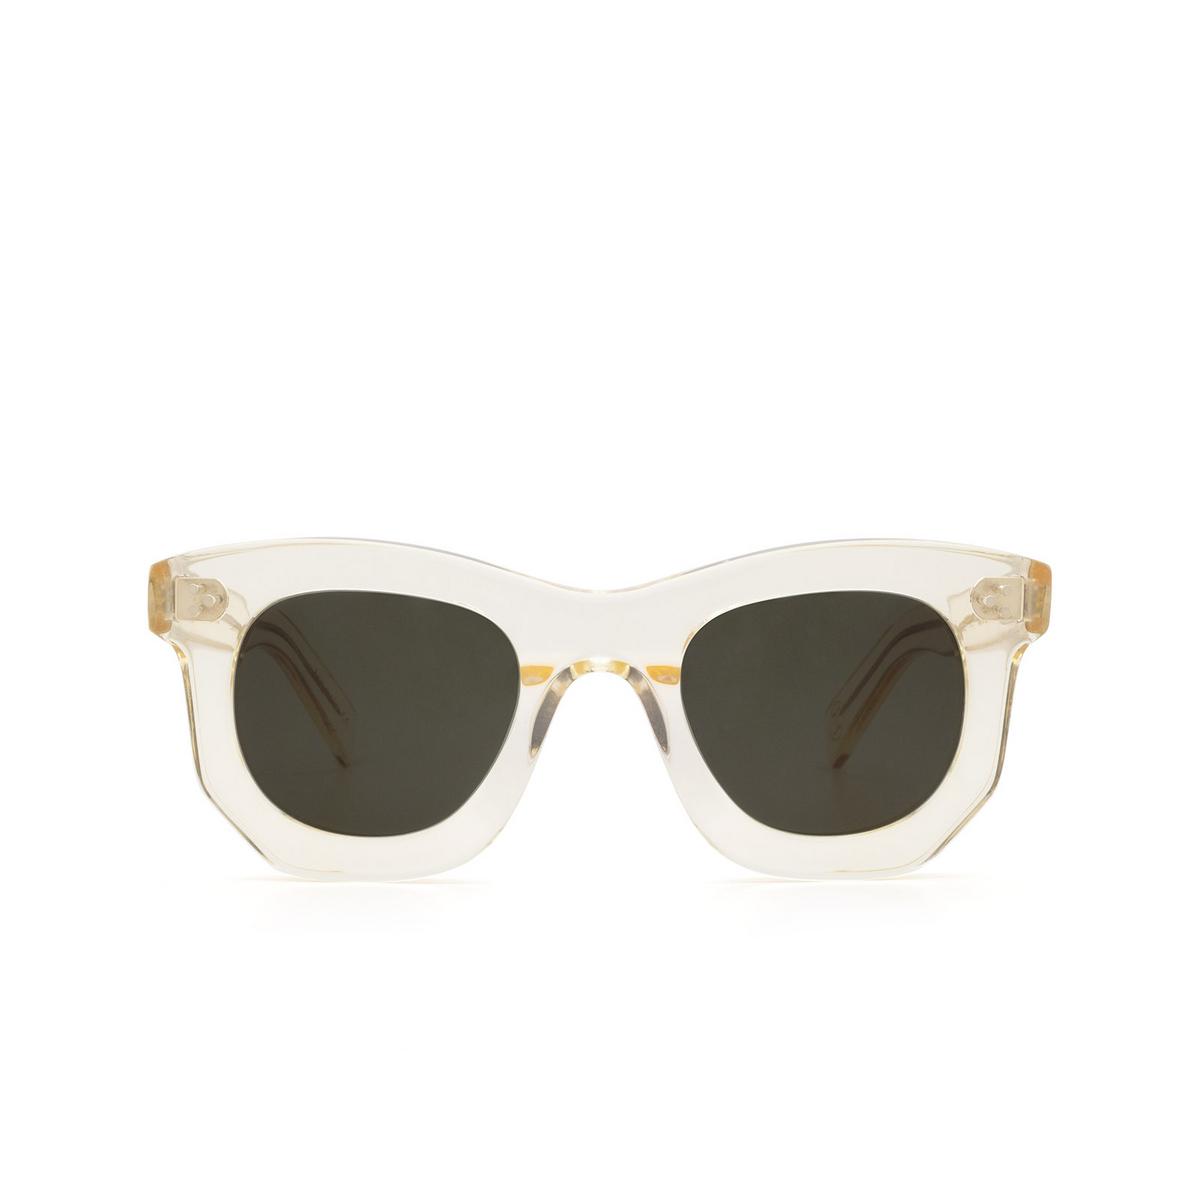 Lesca® Irregular Sunglasses: Ogre Sun color Champagne 186 - front view.